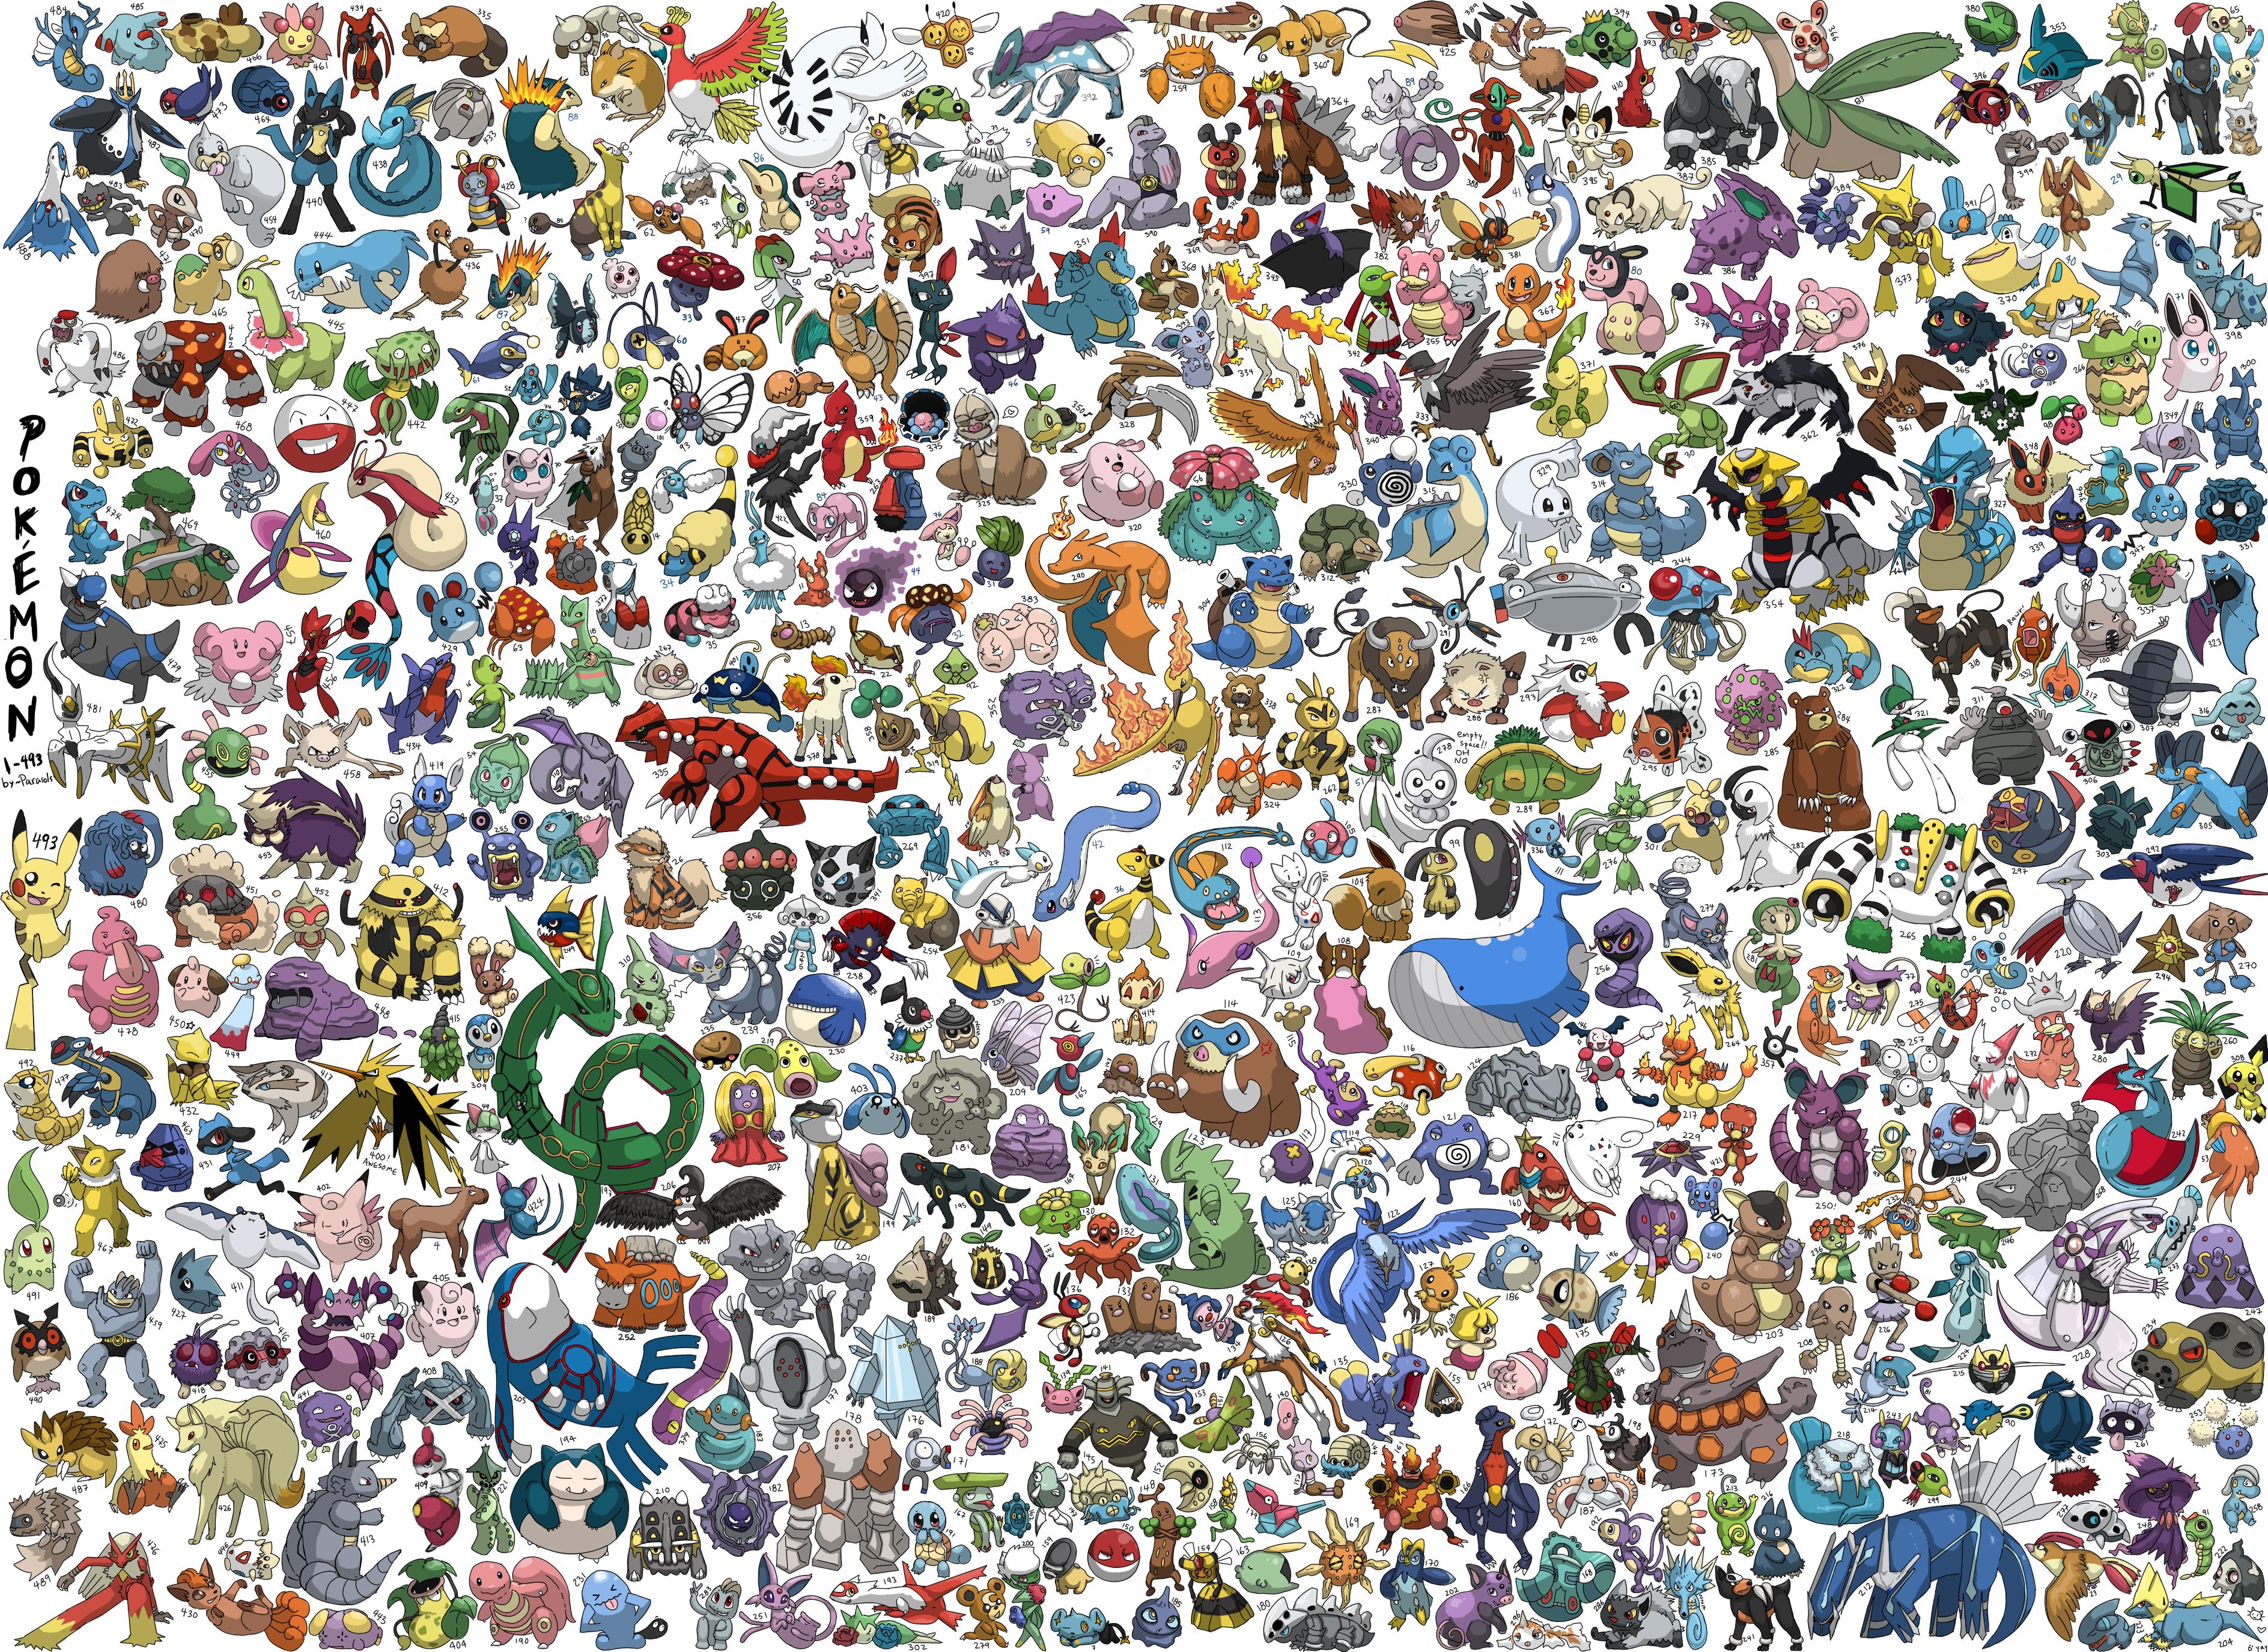 Pokemon. by Parasols on DeviantArt